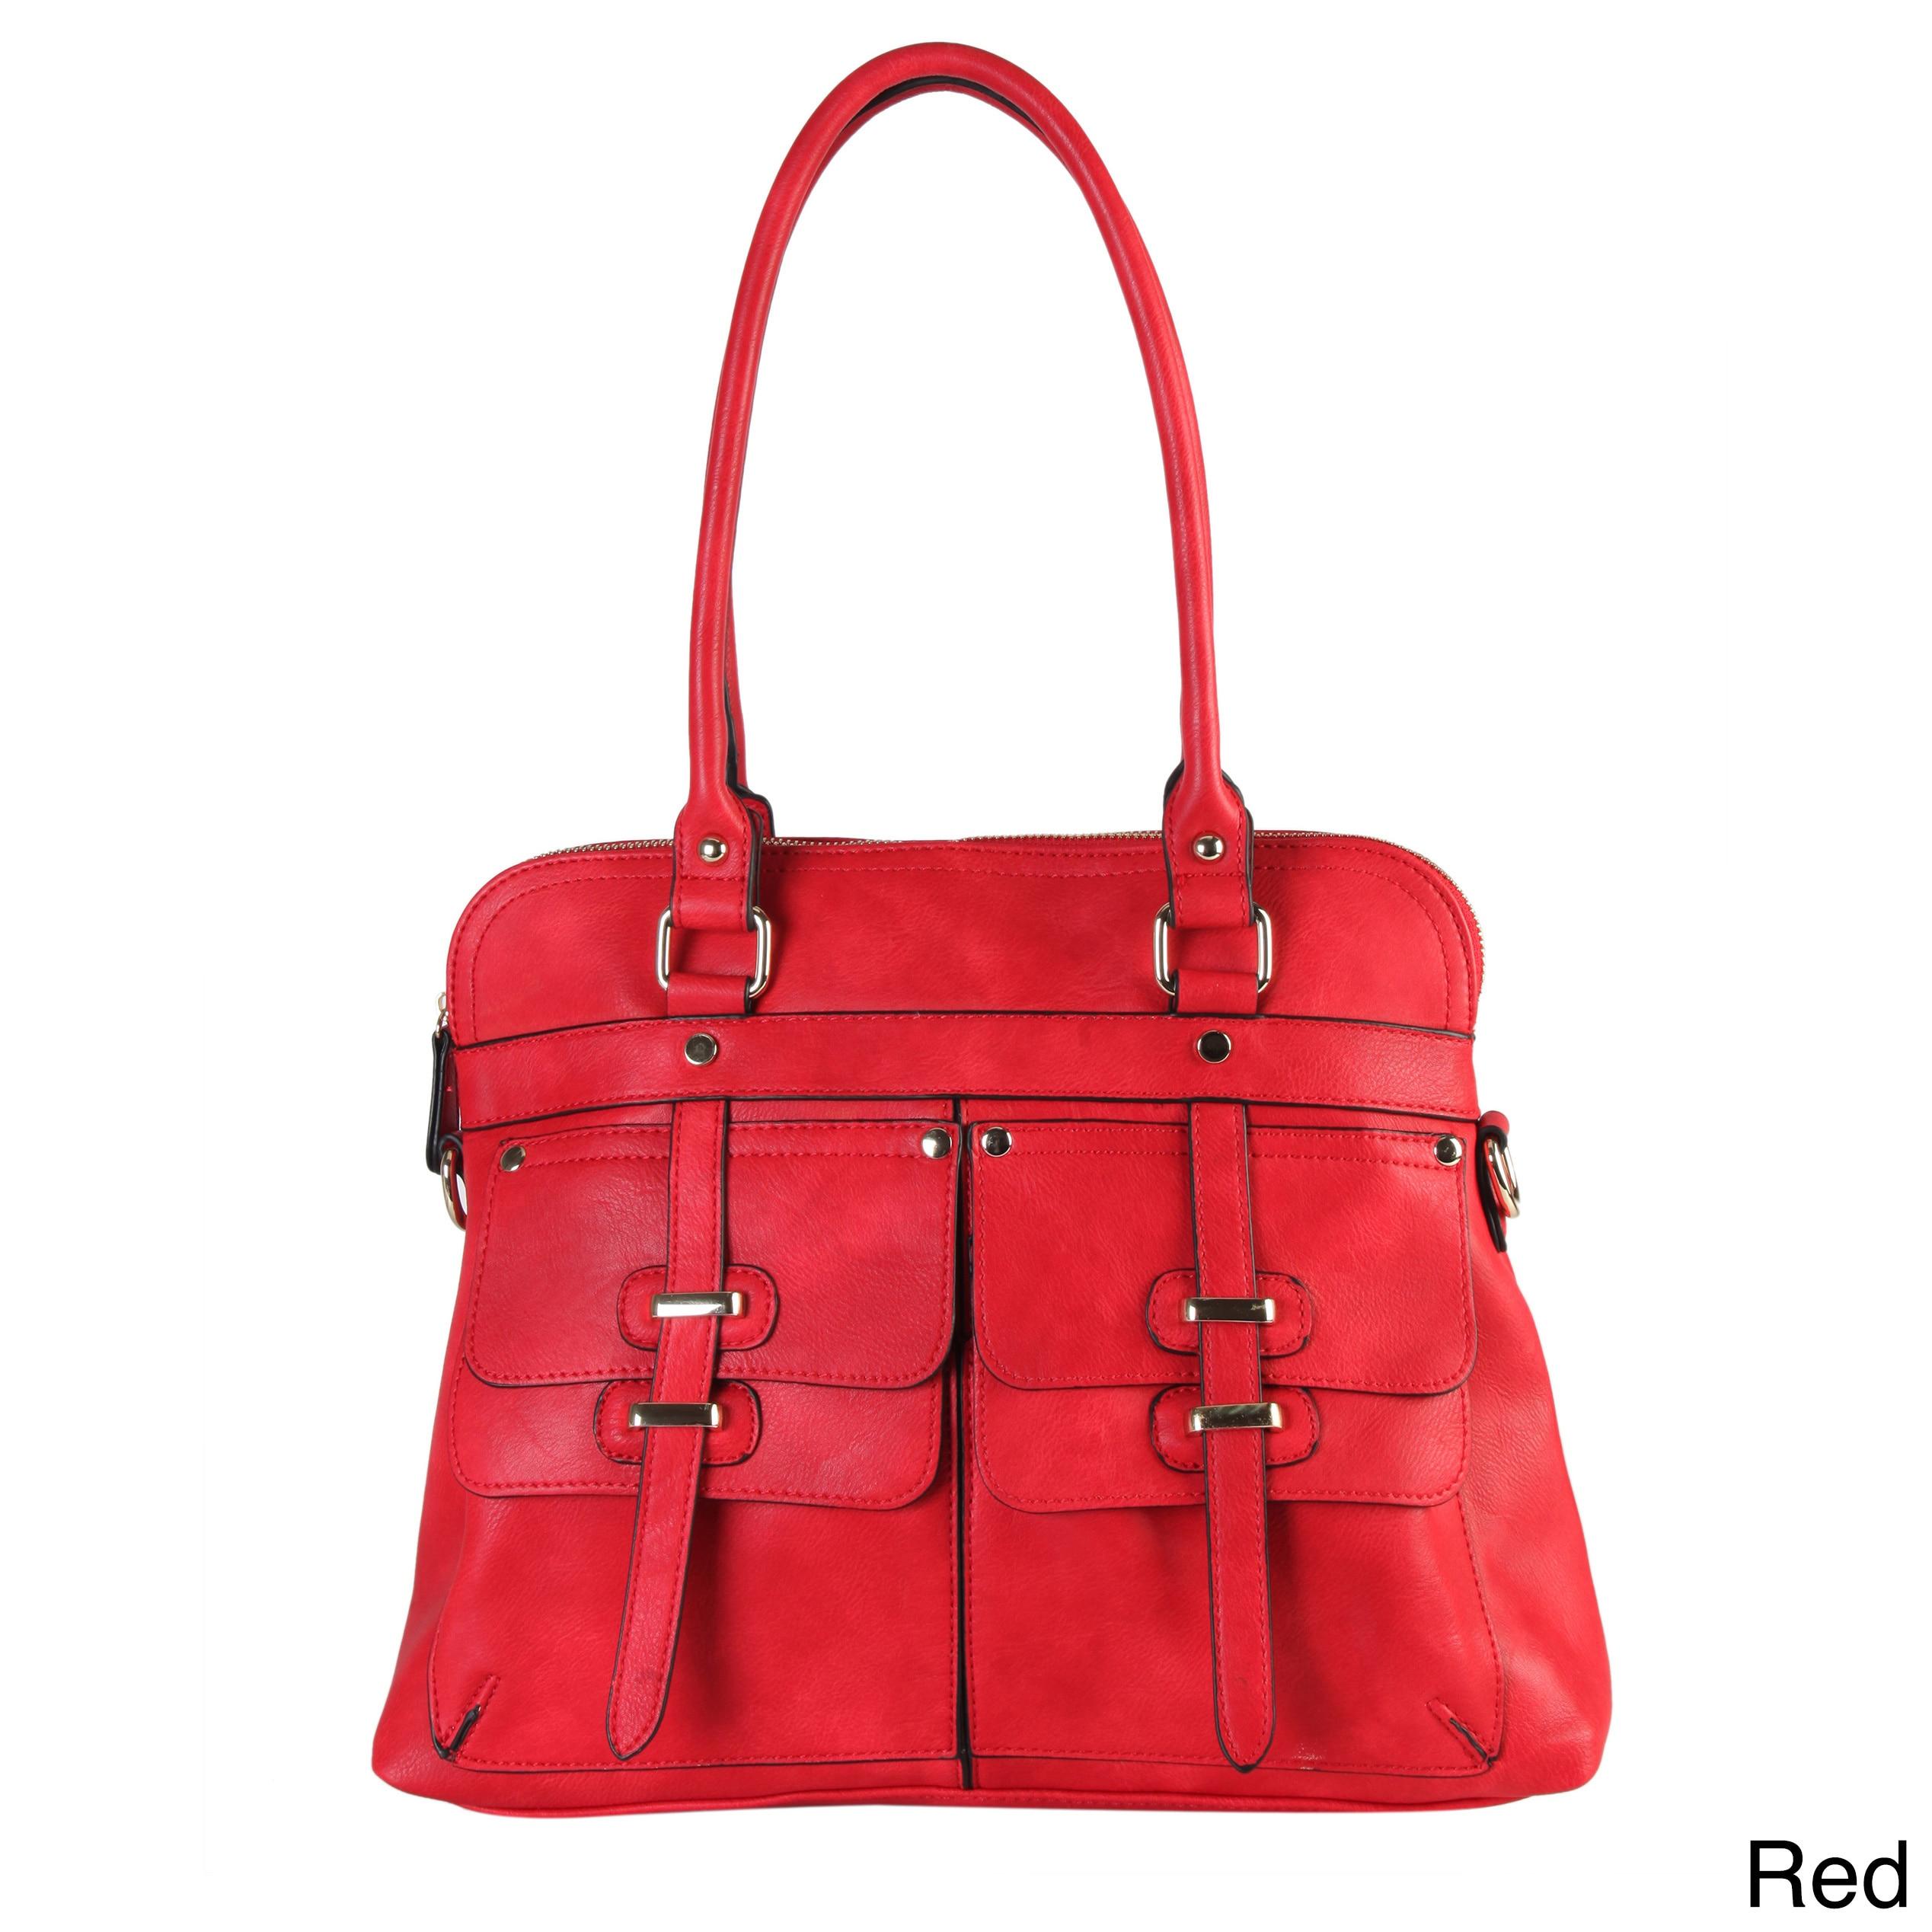 4009de1014 Shop Rimen and Co. Faux Leather Two-top Handle Zippered-closure ...